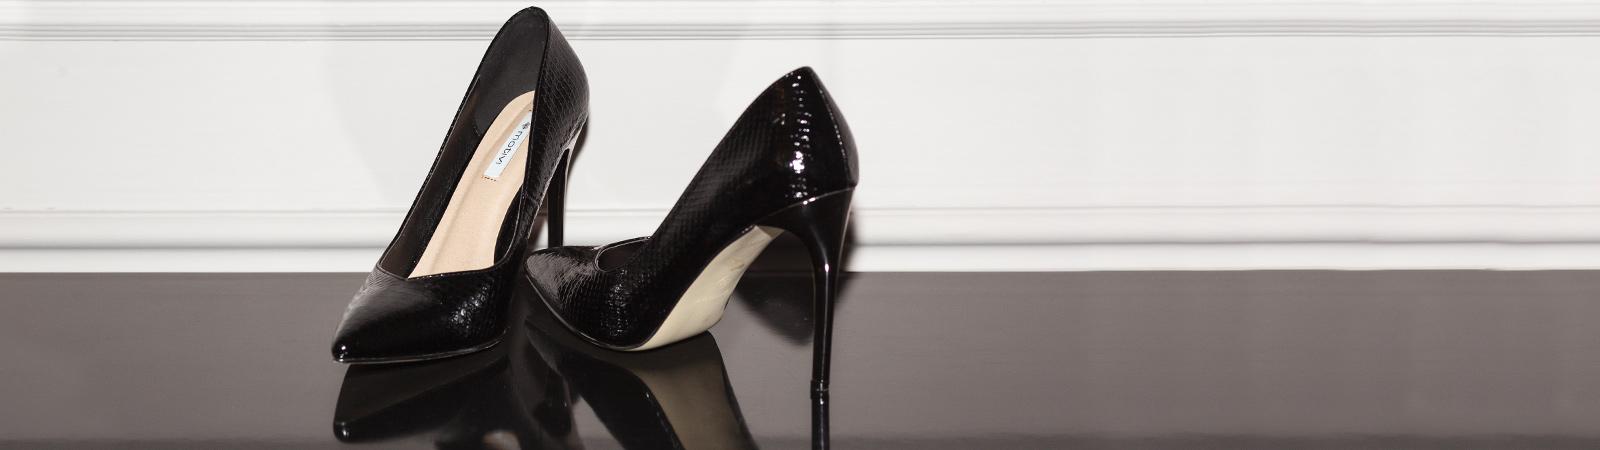 Motivi - scarpe